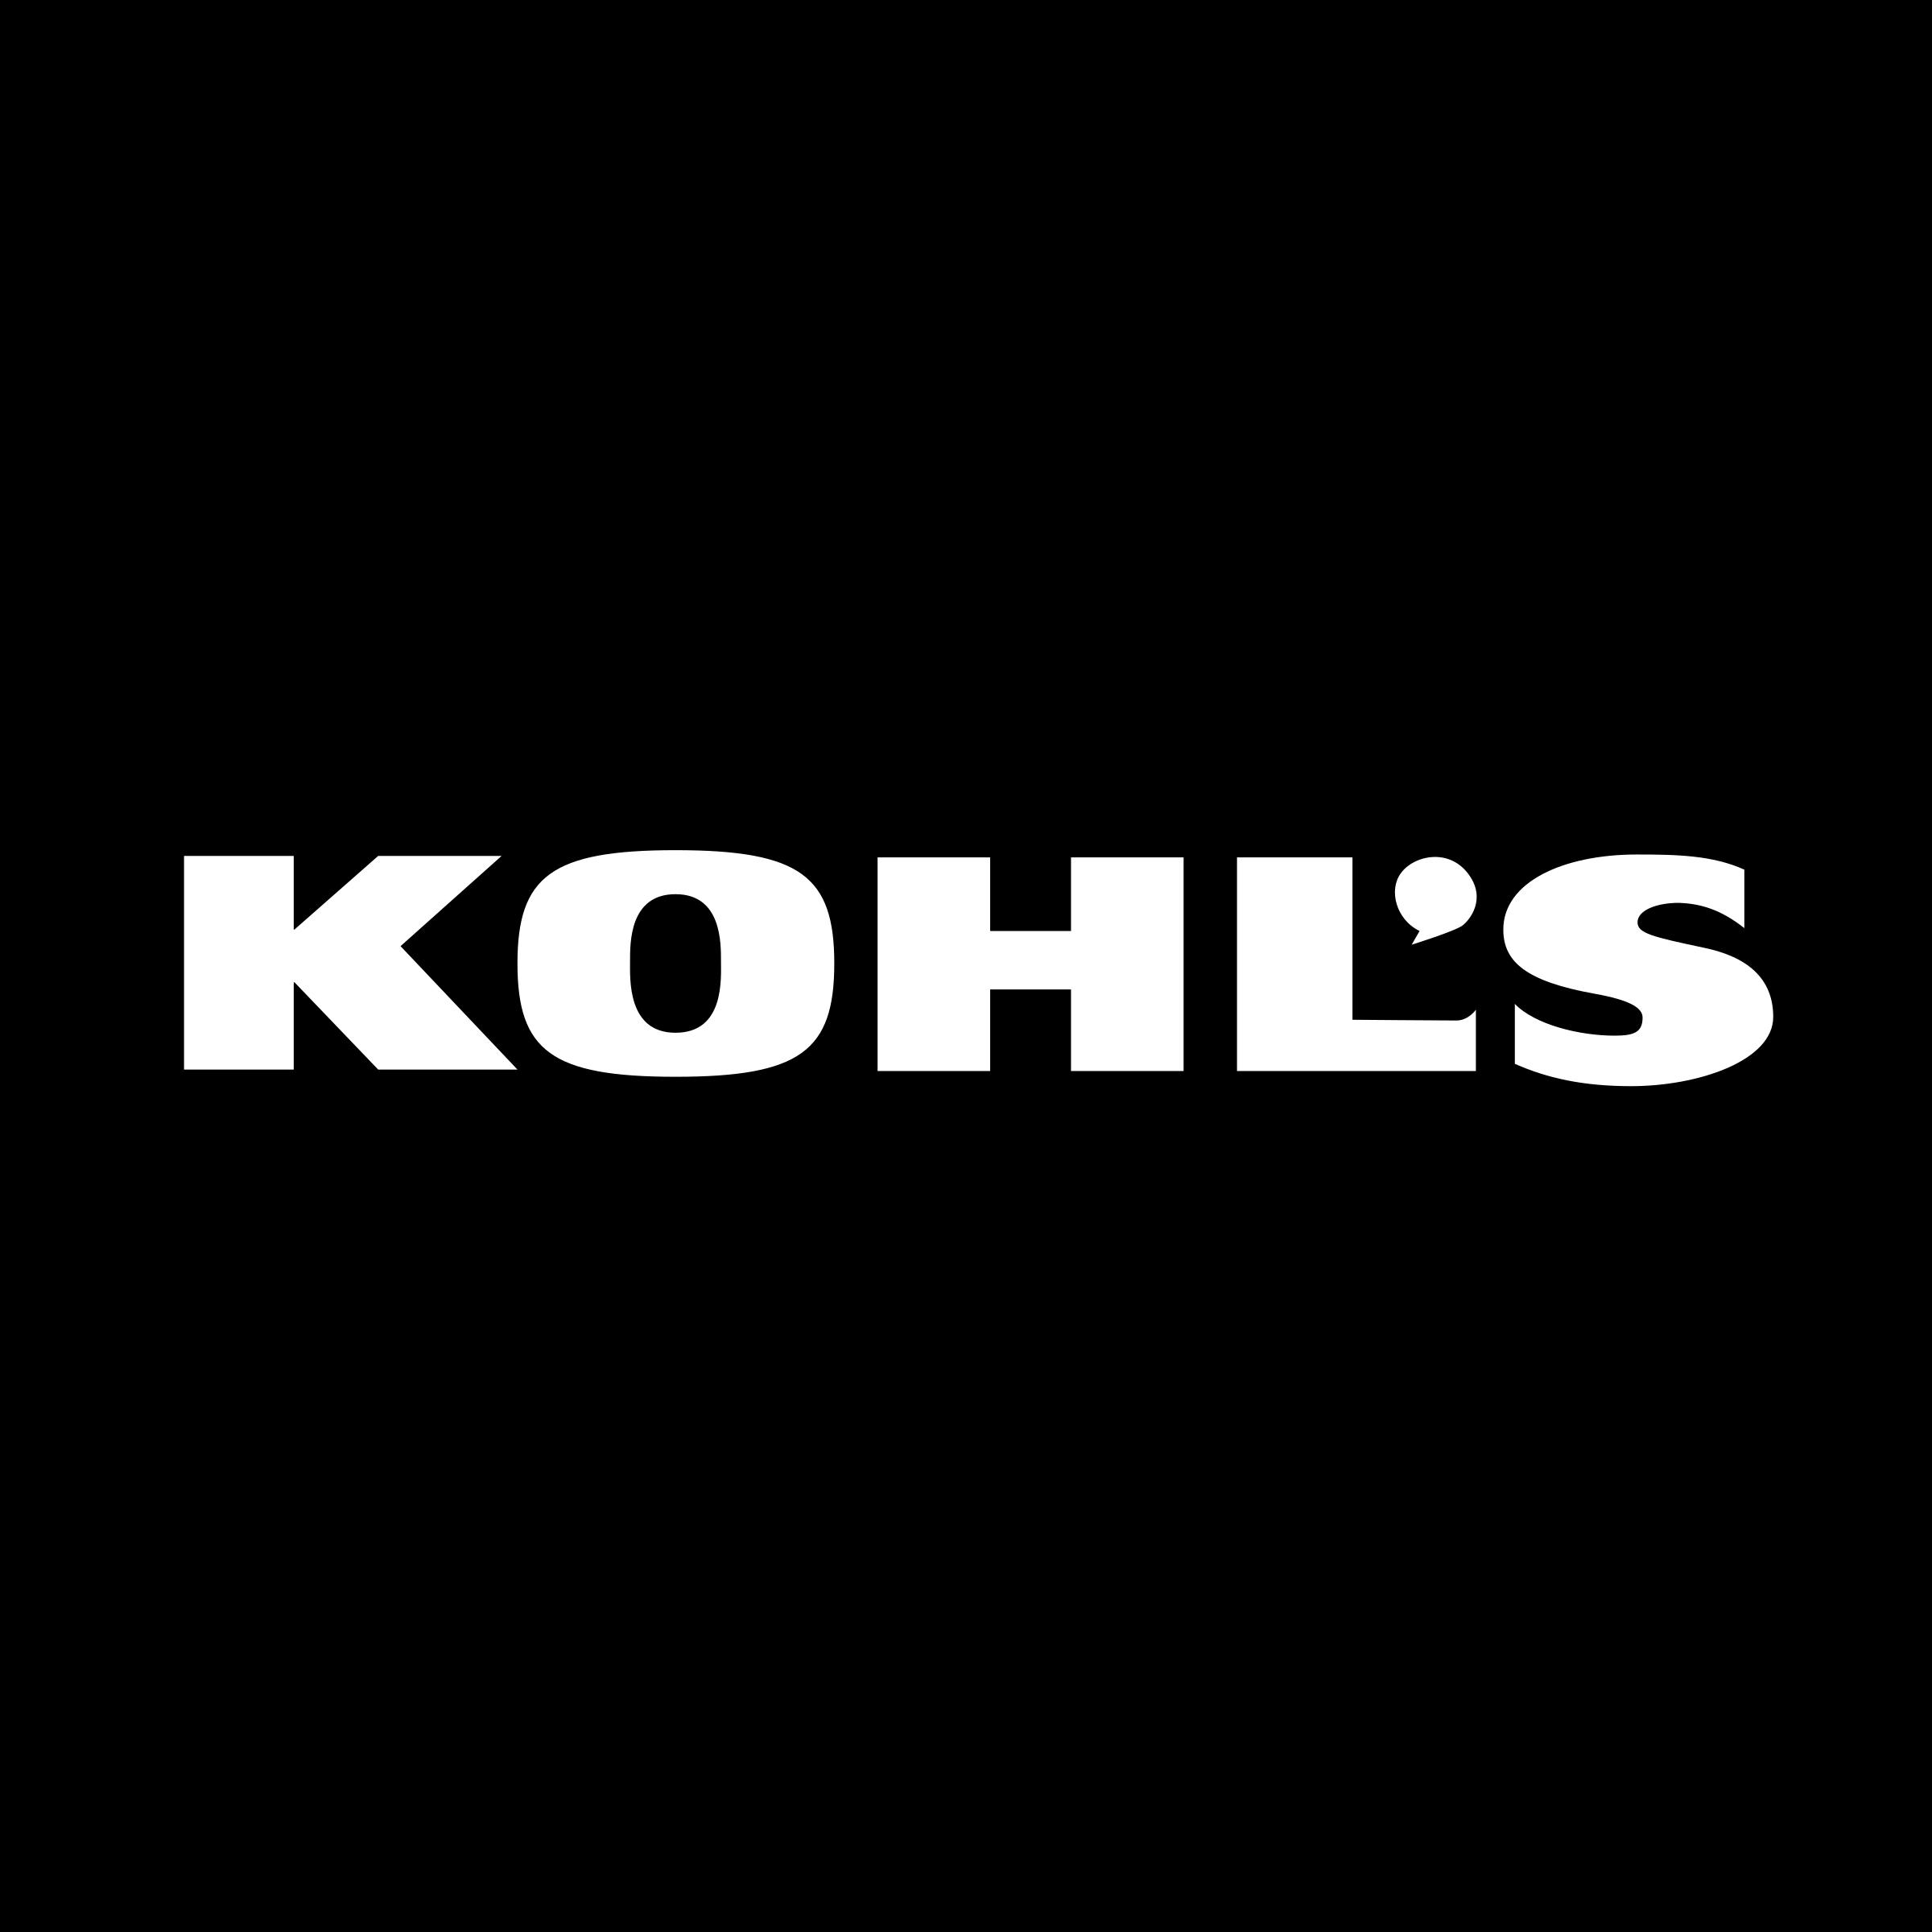 Use Kohls Coupons